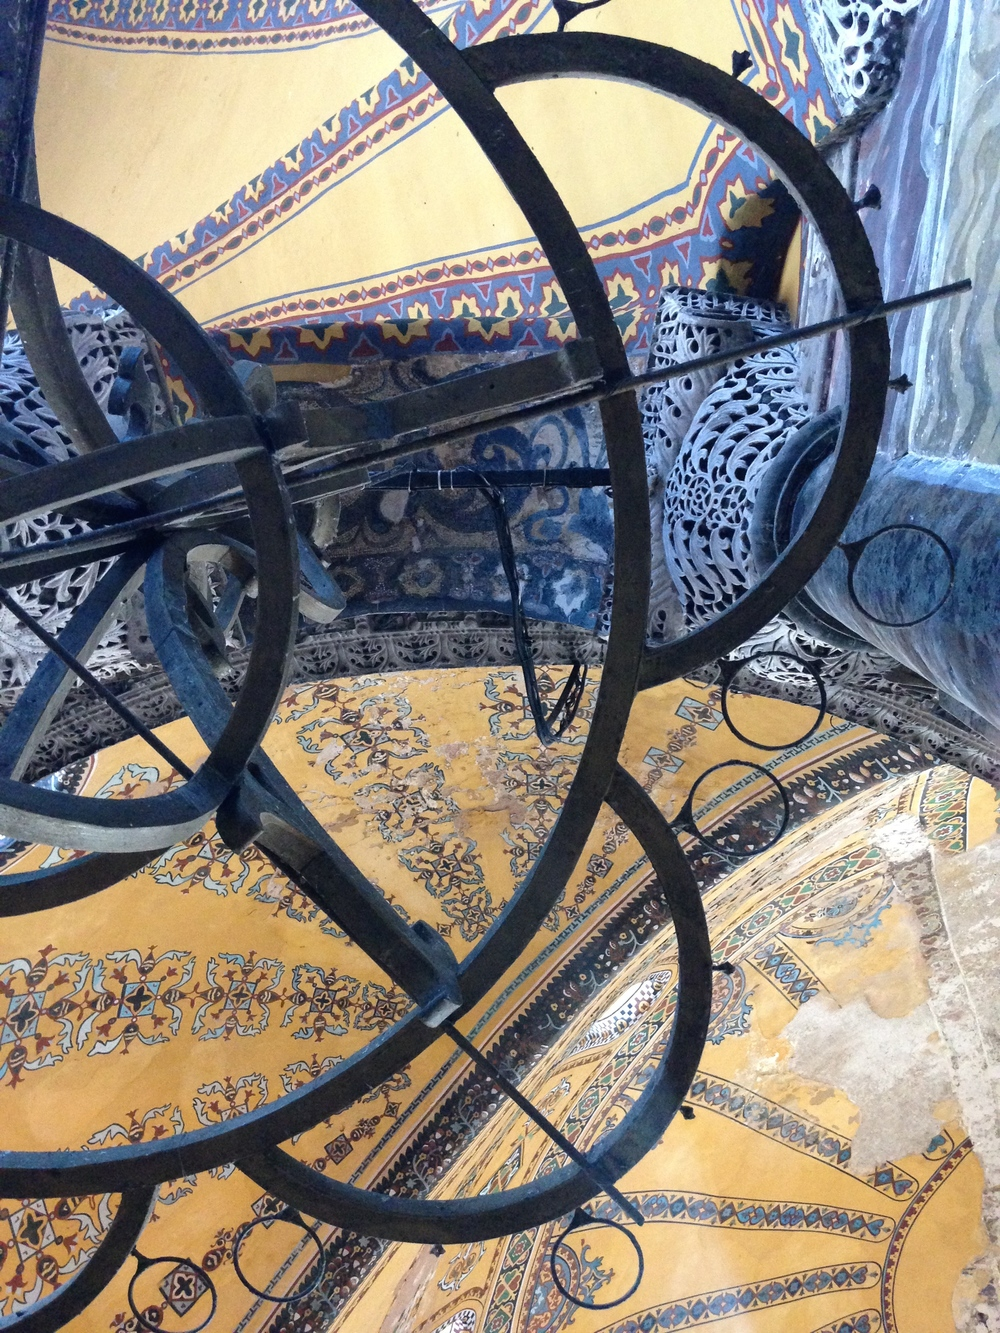 My very best photo of Hagia Sophia in Istanbul. It is a bit dizzy making but I like it.